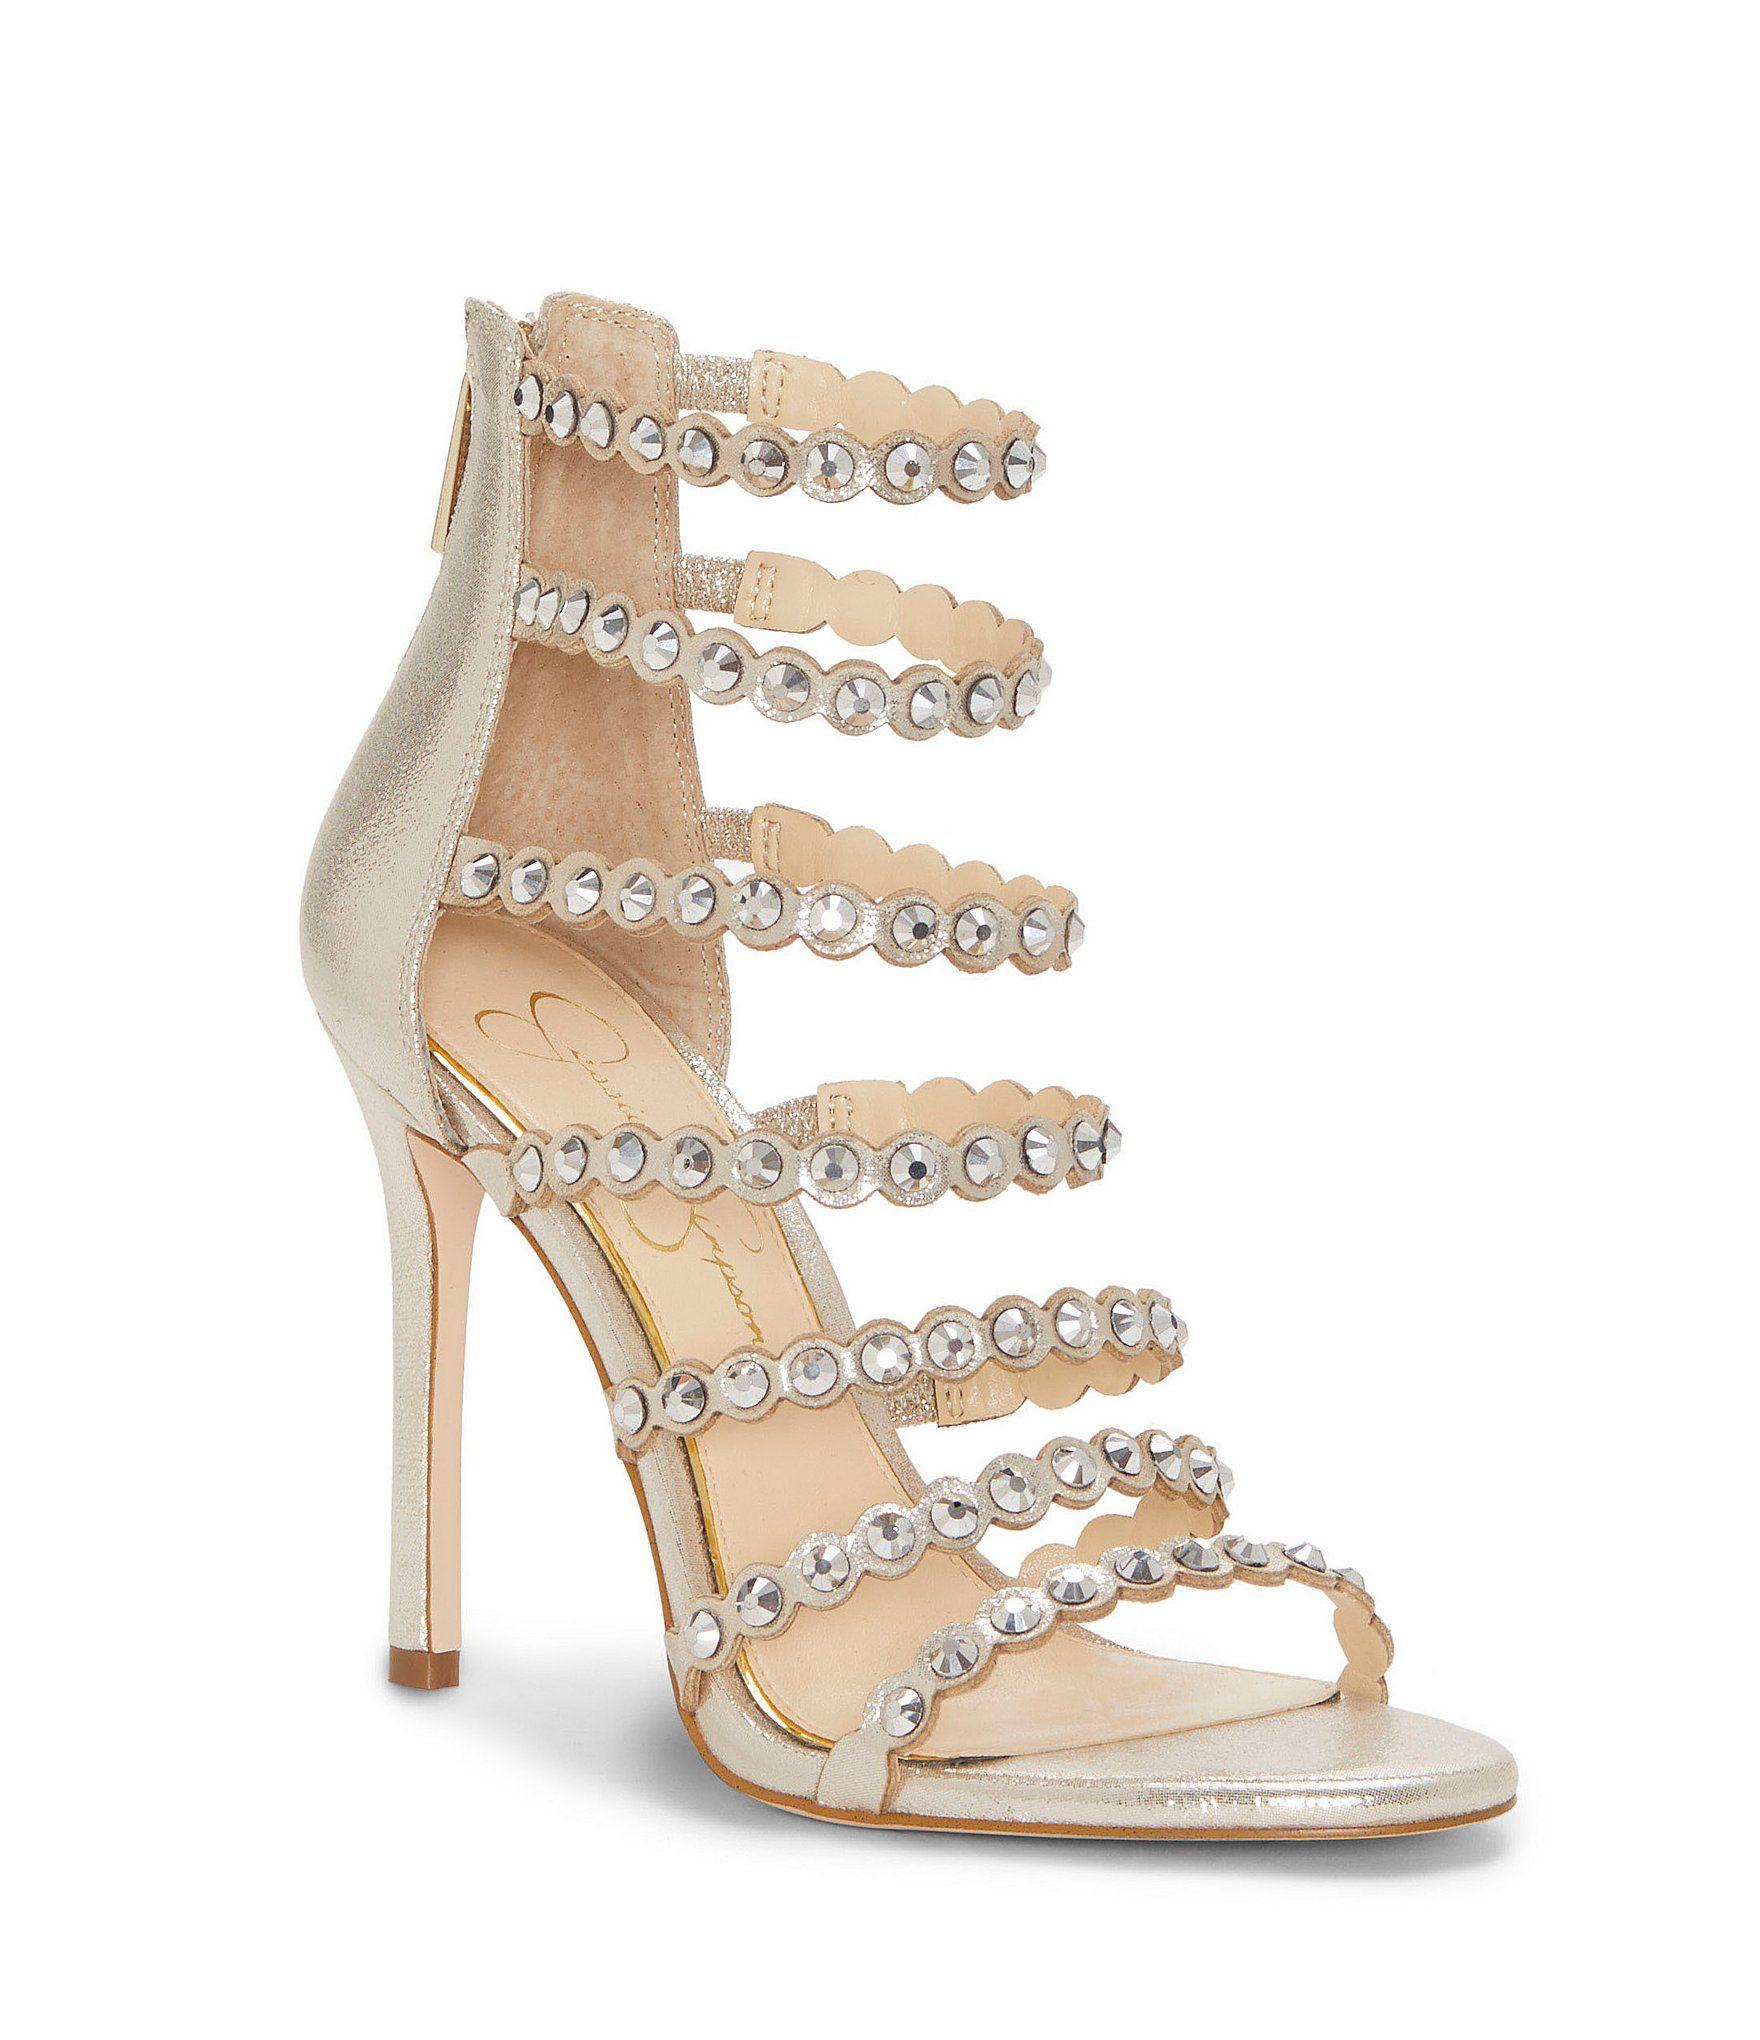 c4b9191491 Shop for Jessica Simpson Jezalynn Rhinestone Jeweled Strappy Dress Sandals  at Dillards.com. Visit Dillards.com to find clothing, accessories, shoes,  ...